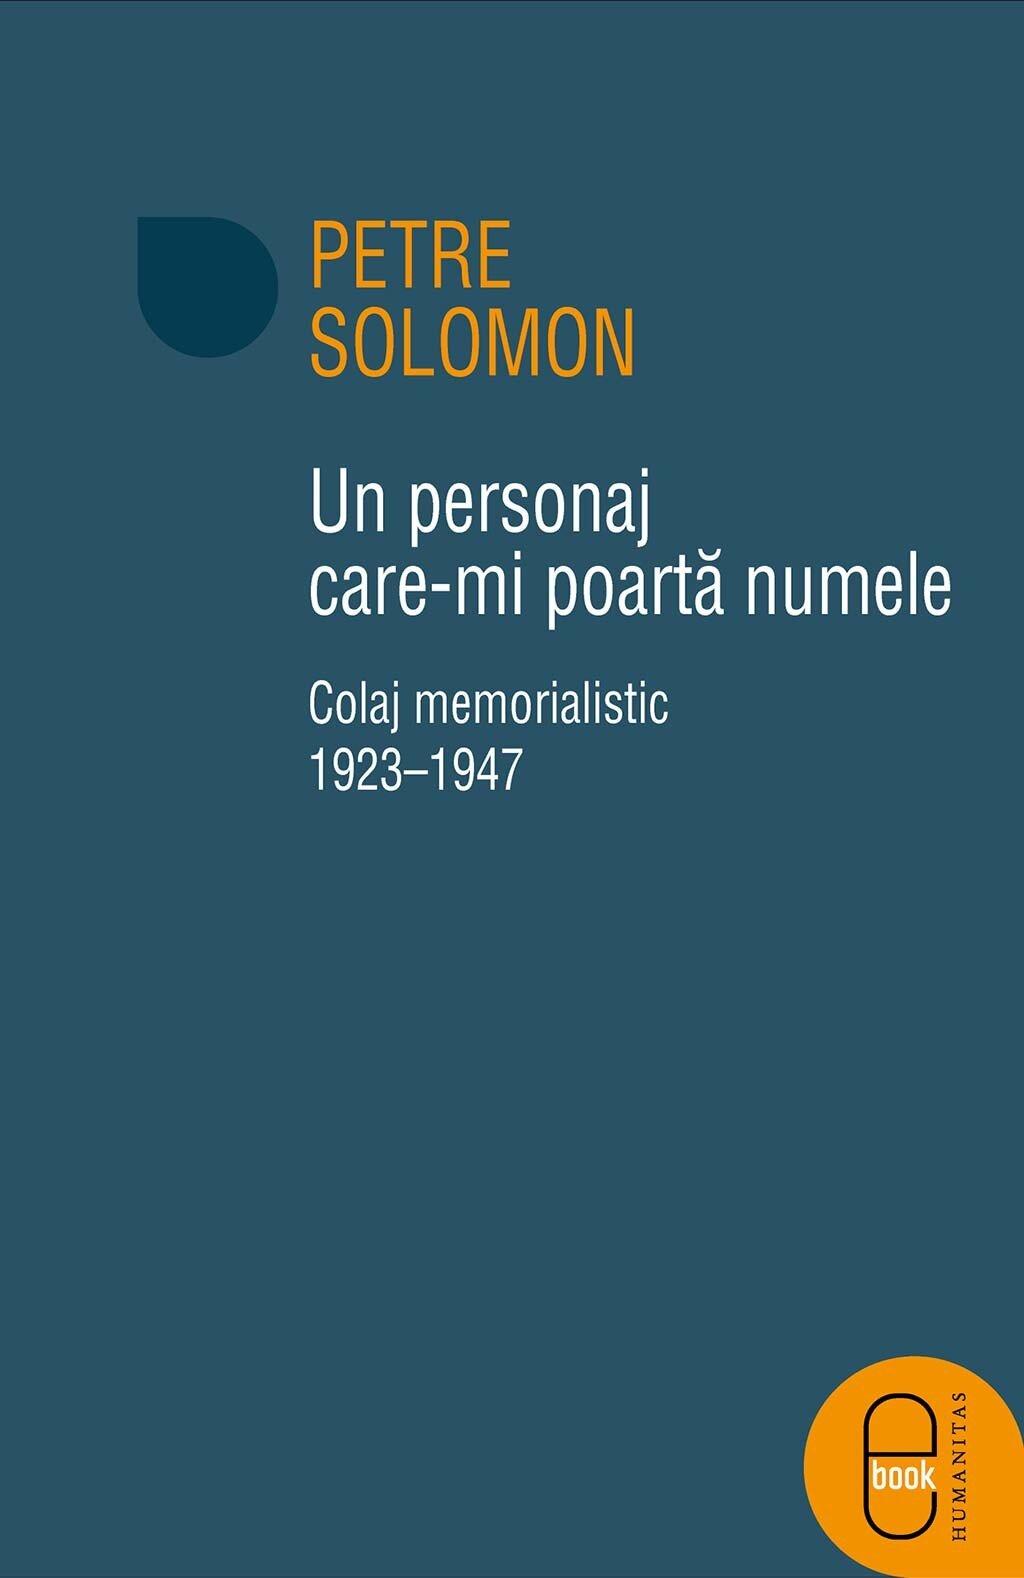 Un personaj care-mi poarta numele. Colaj memorialistic 1923-1947 (eBook)